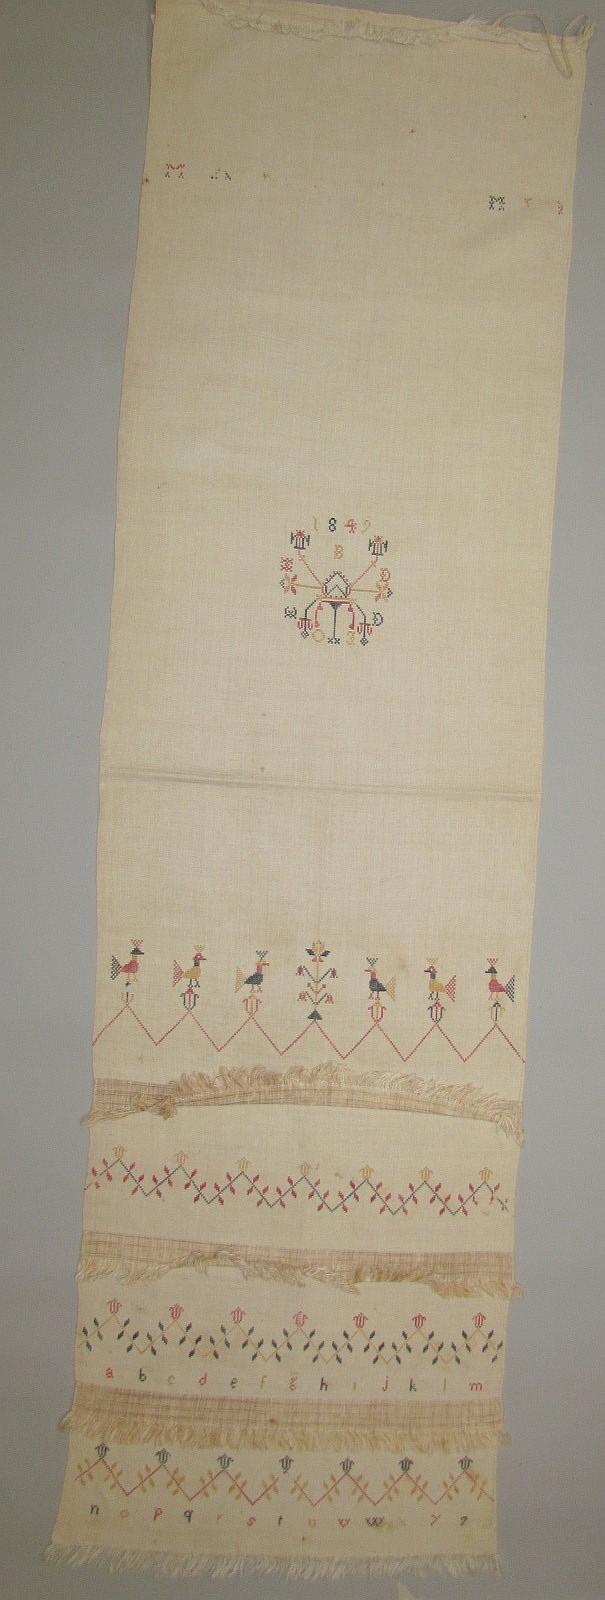 Show Towel, Lancaster County Mennonite origin